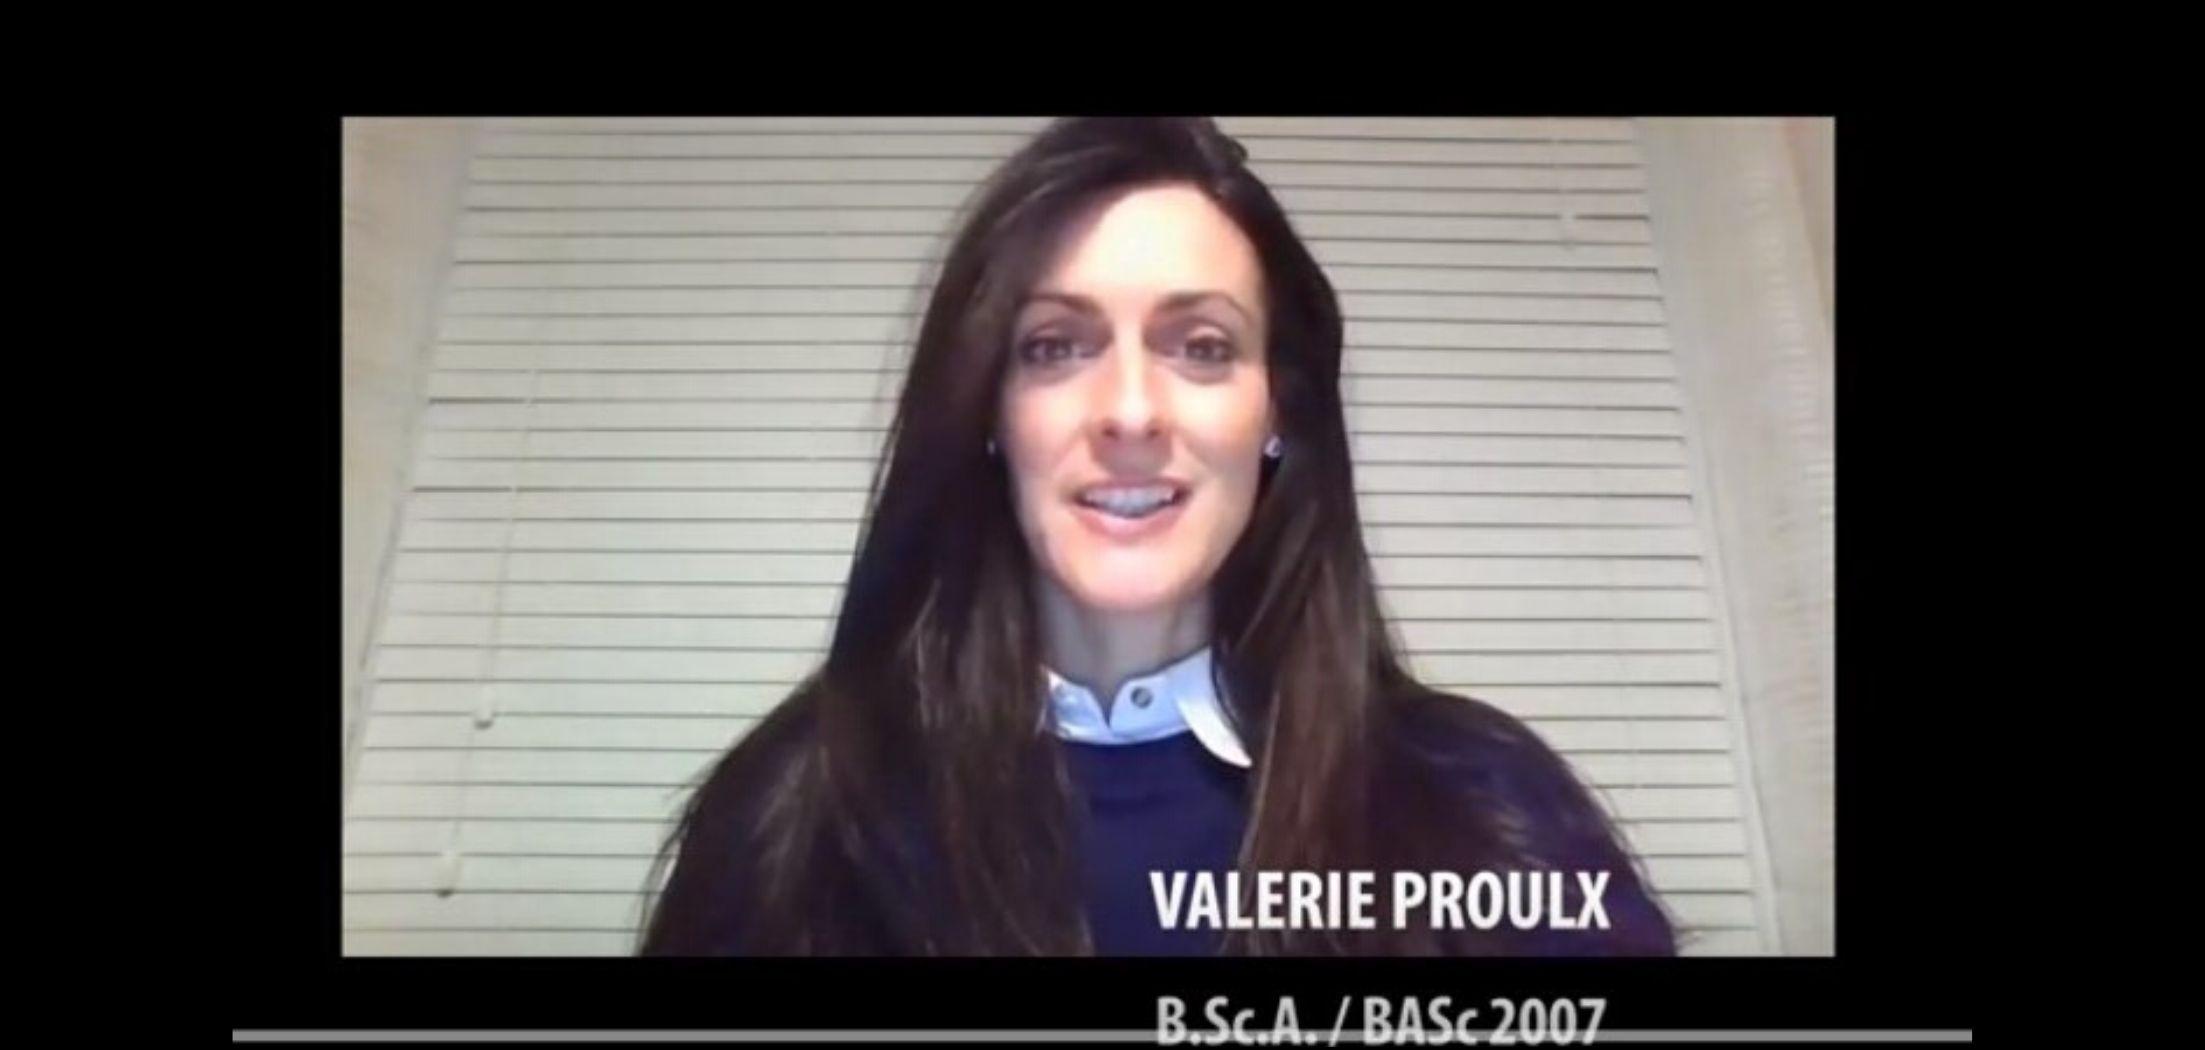 Valerie Proulx alumni from 2007